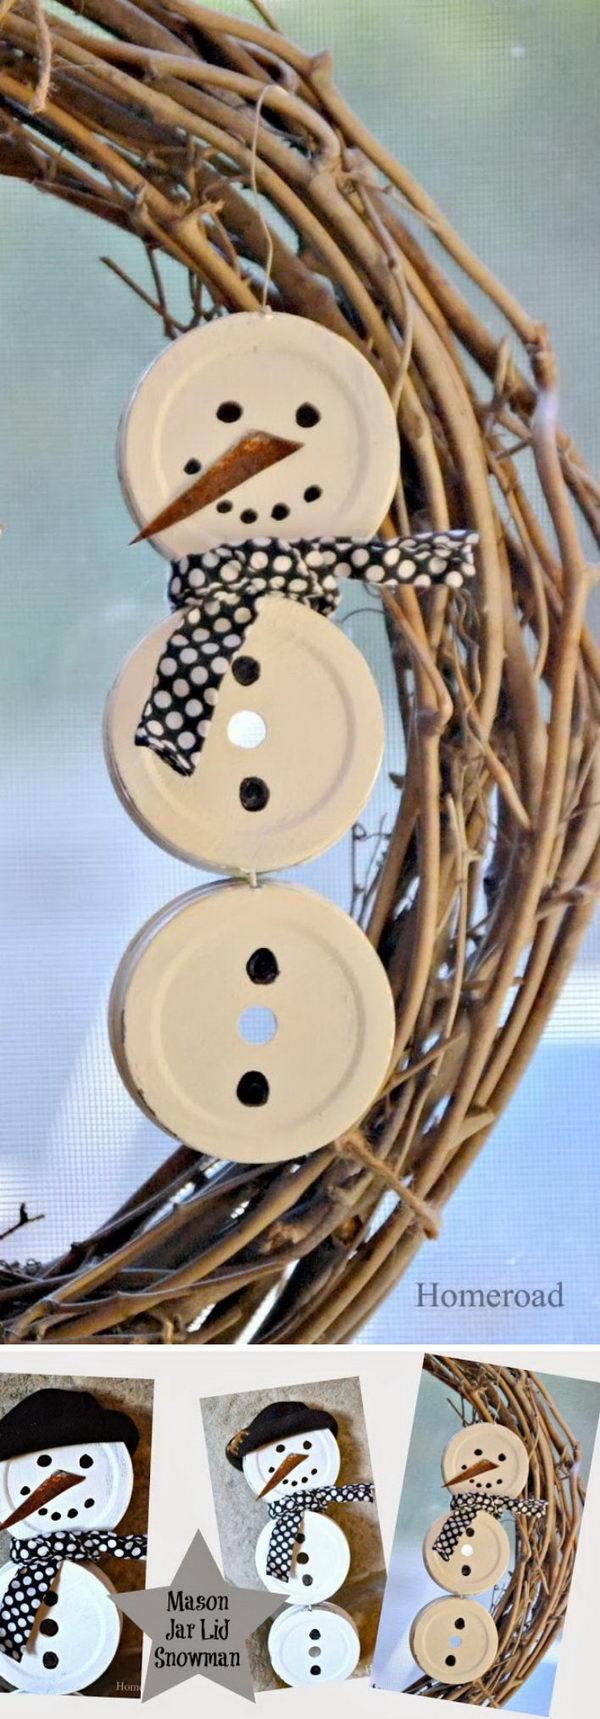 DIY Mason Jar Lid Snowman.